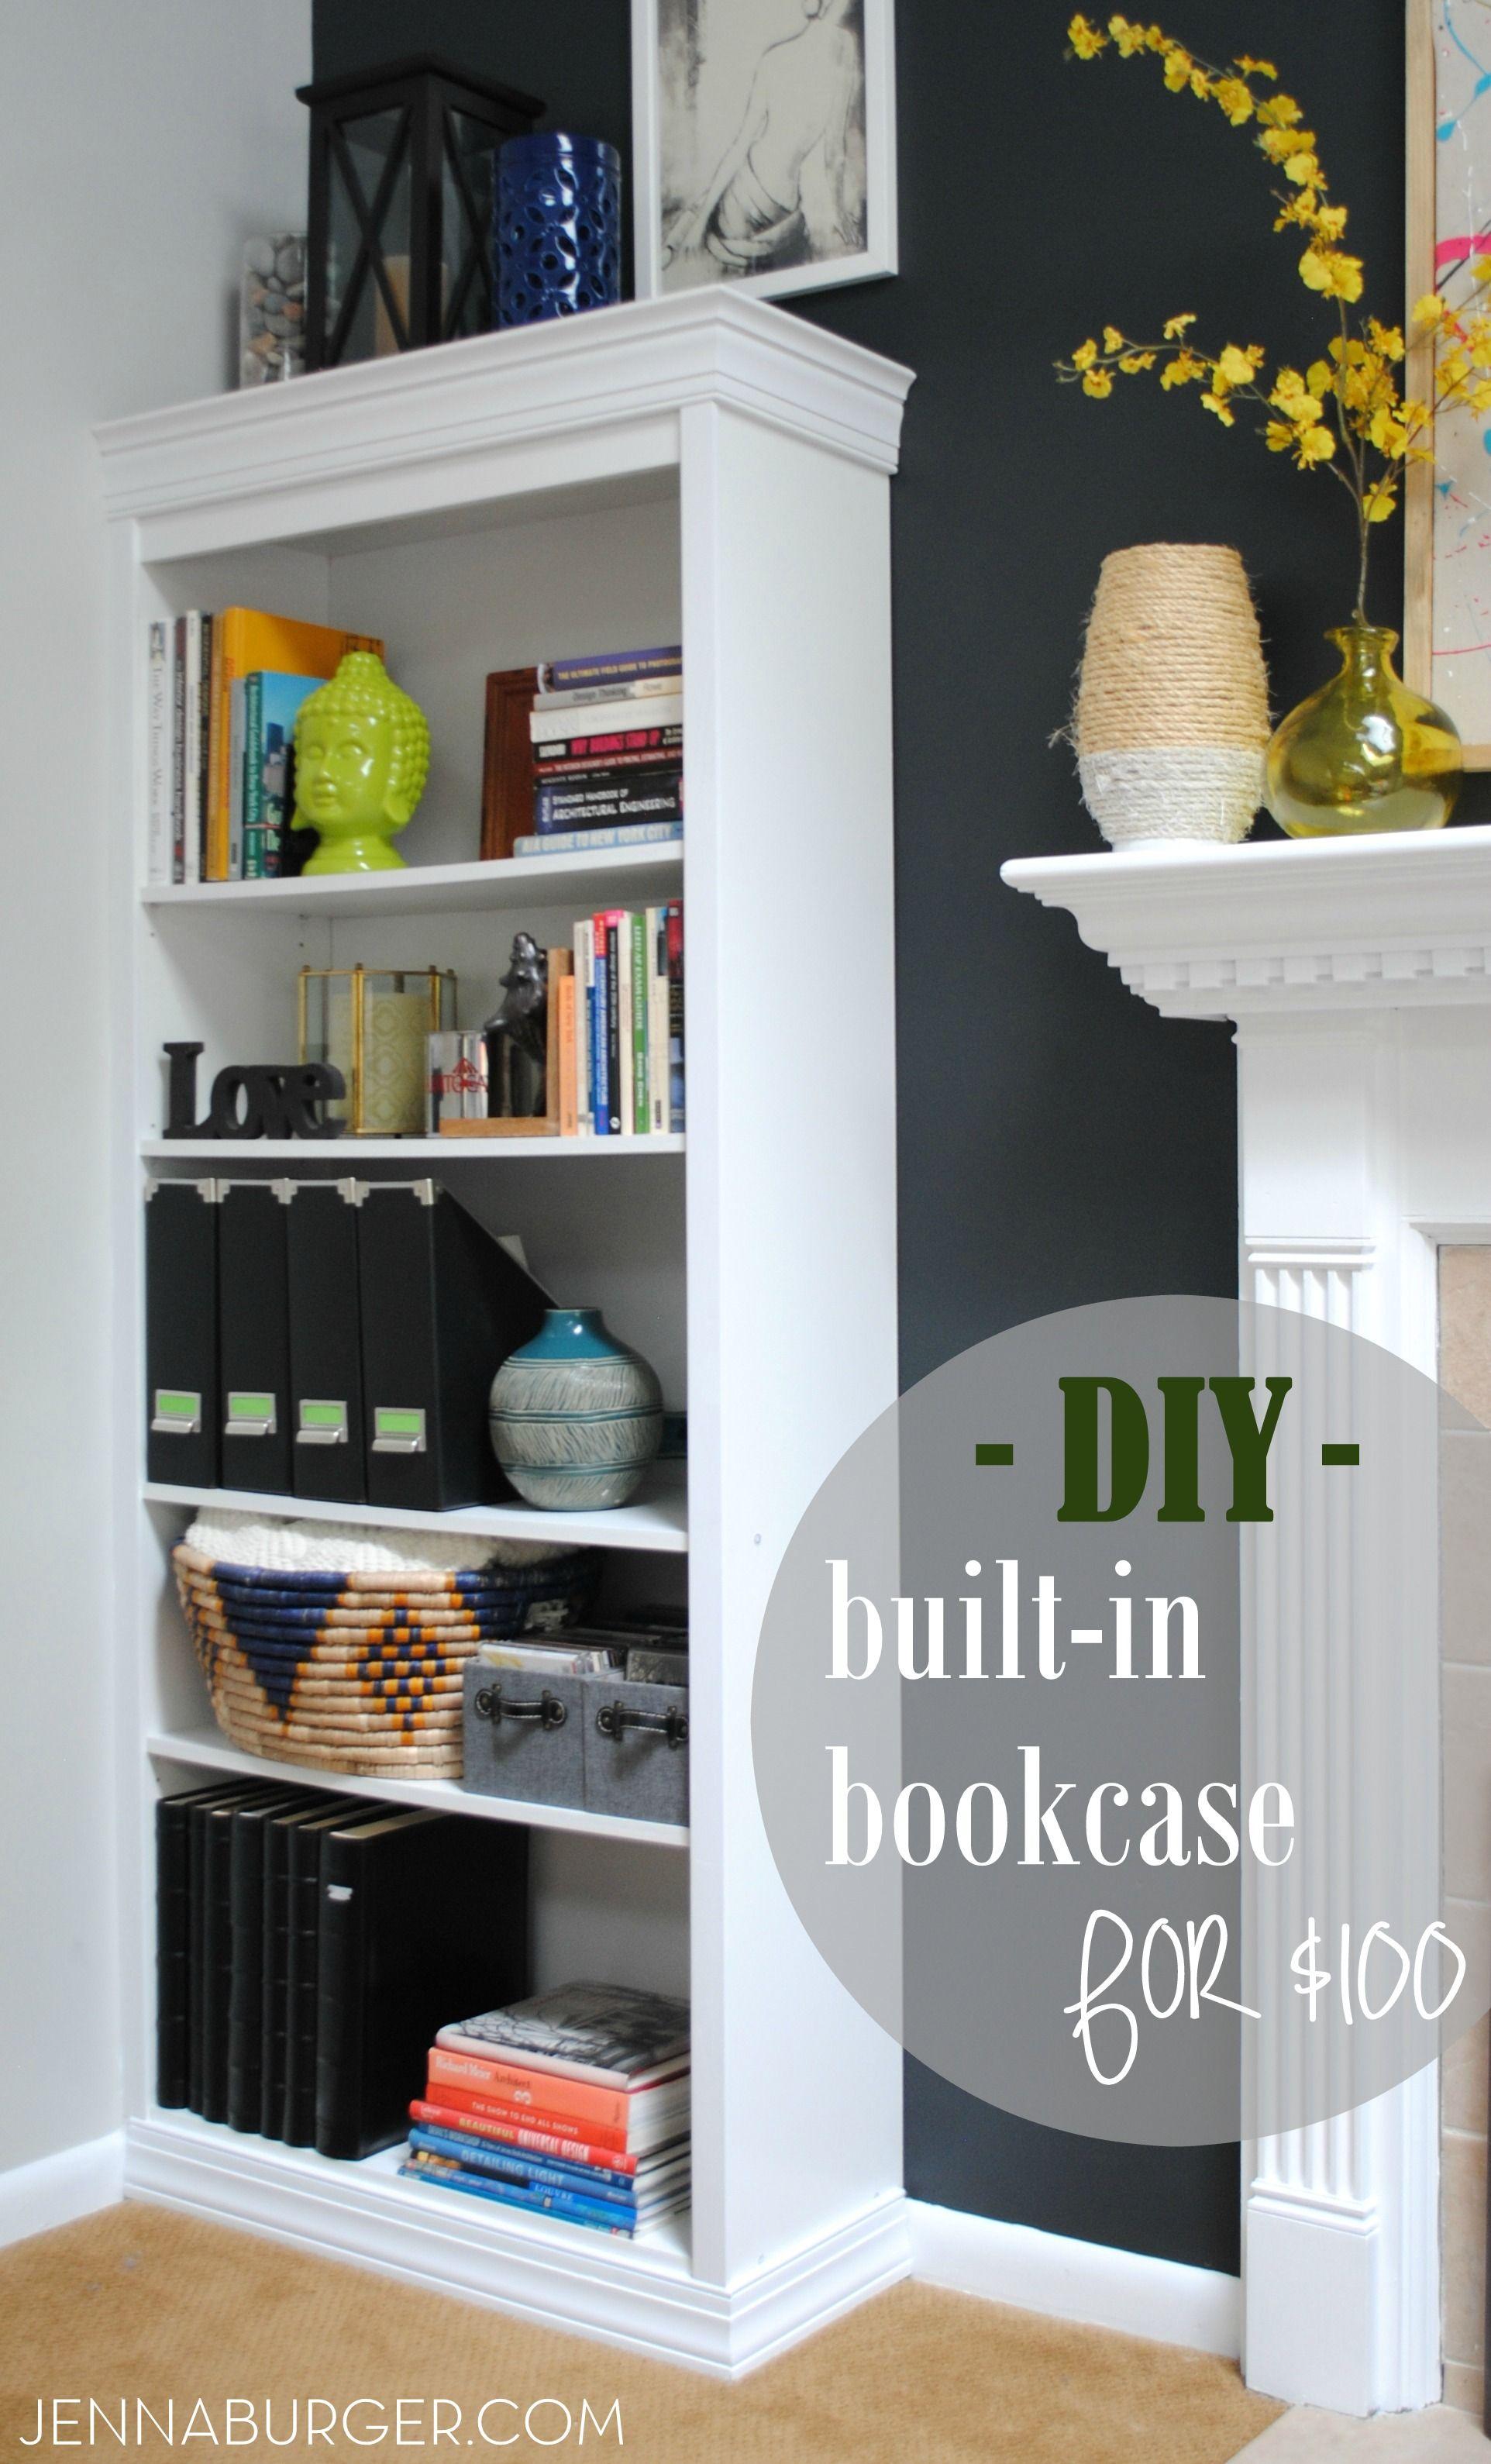 Cushioned window bench and bookshelf hgtv -  Diy Tutorial How To Make A Laminate Bookcase Look Like A Custom Built